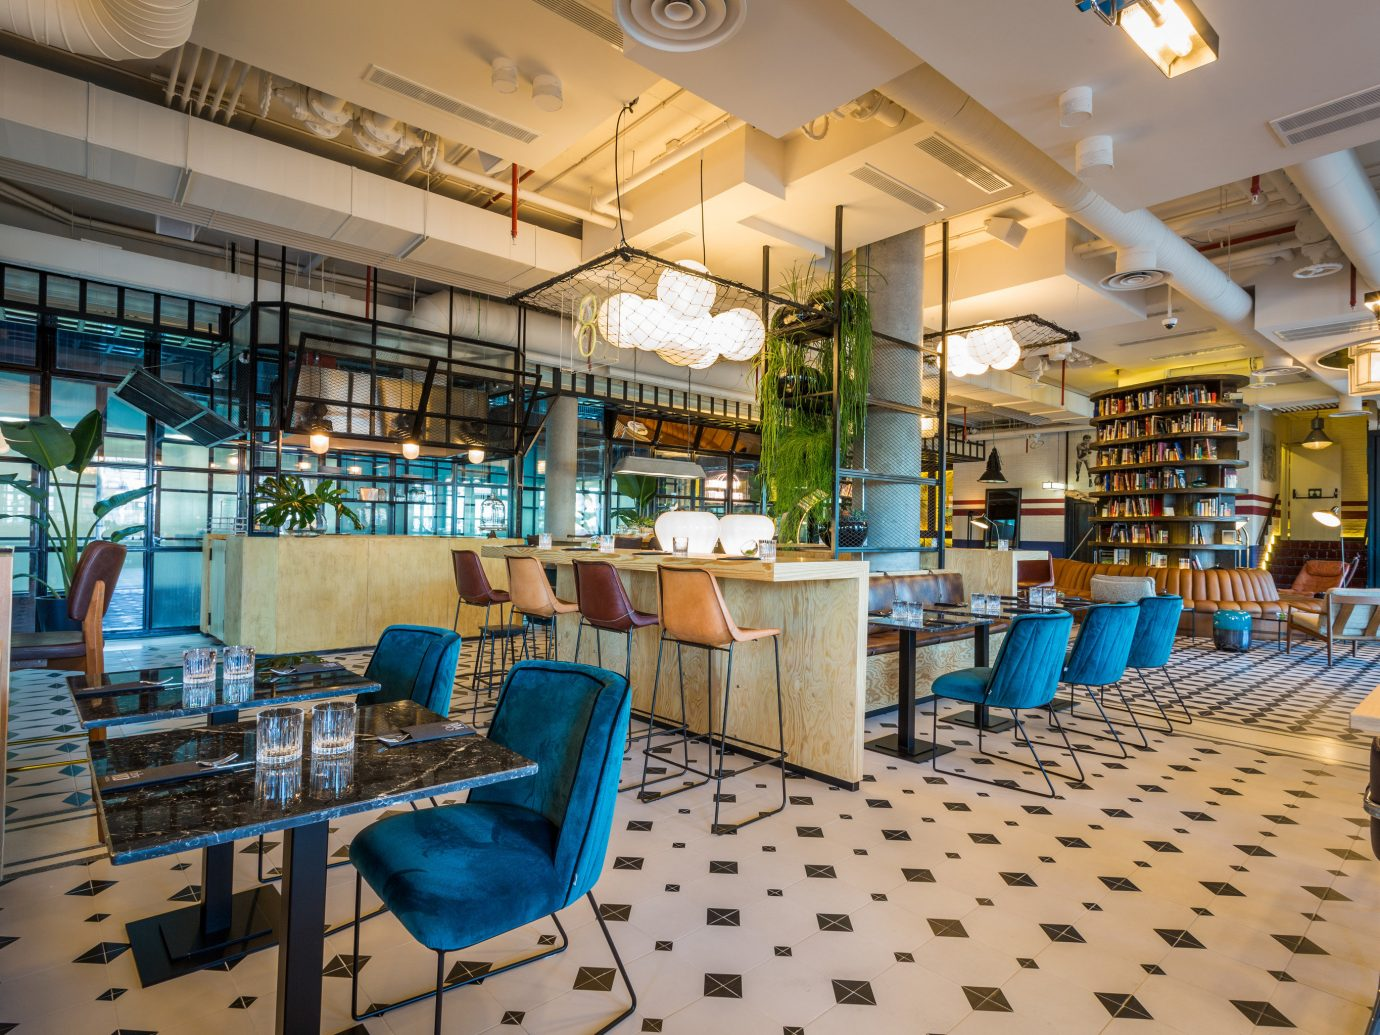 Hotels Madrid Spain indoor floor chair ceiling room restaurant blue interior design cafeteria furniture Resort area several